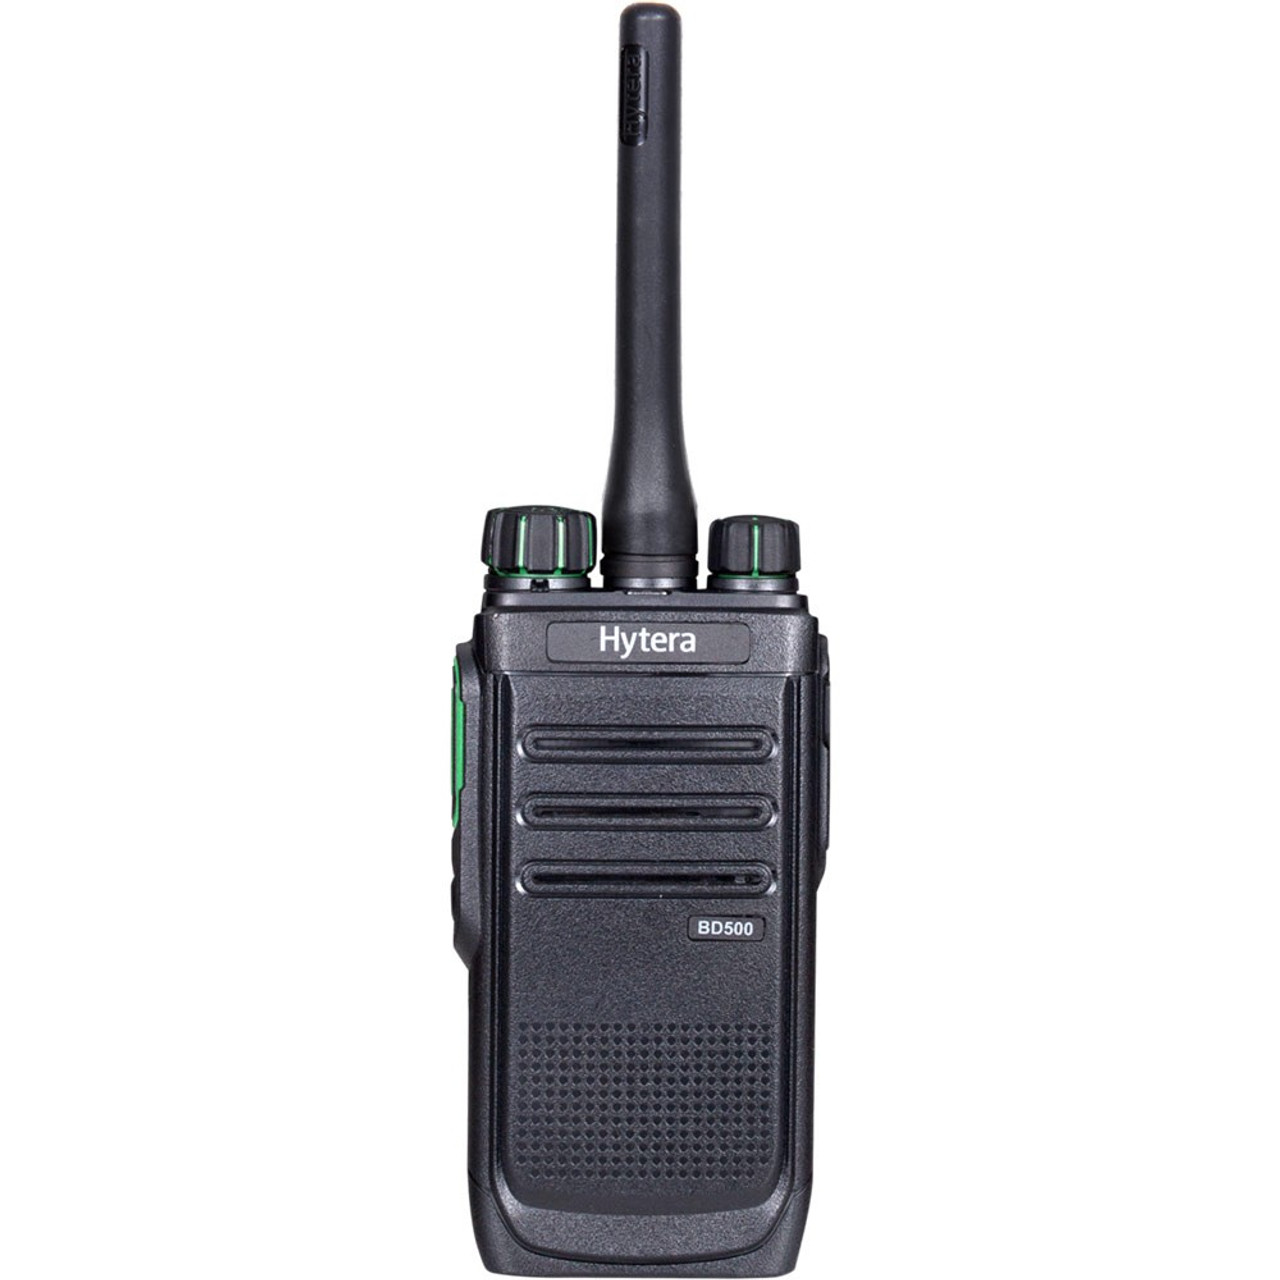 Hytera Bd502 Hytera Uhf Portable Radio Two Way Direct